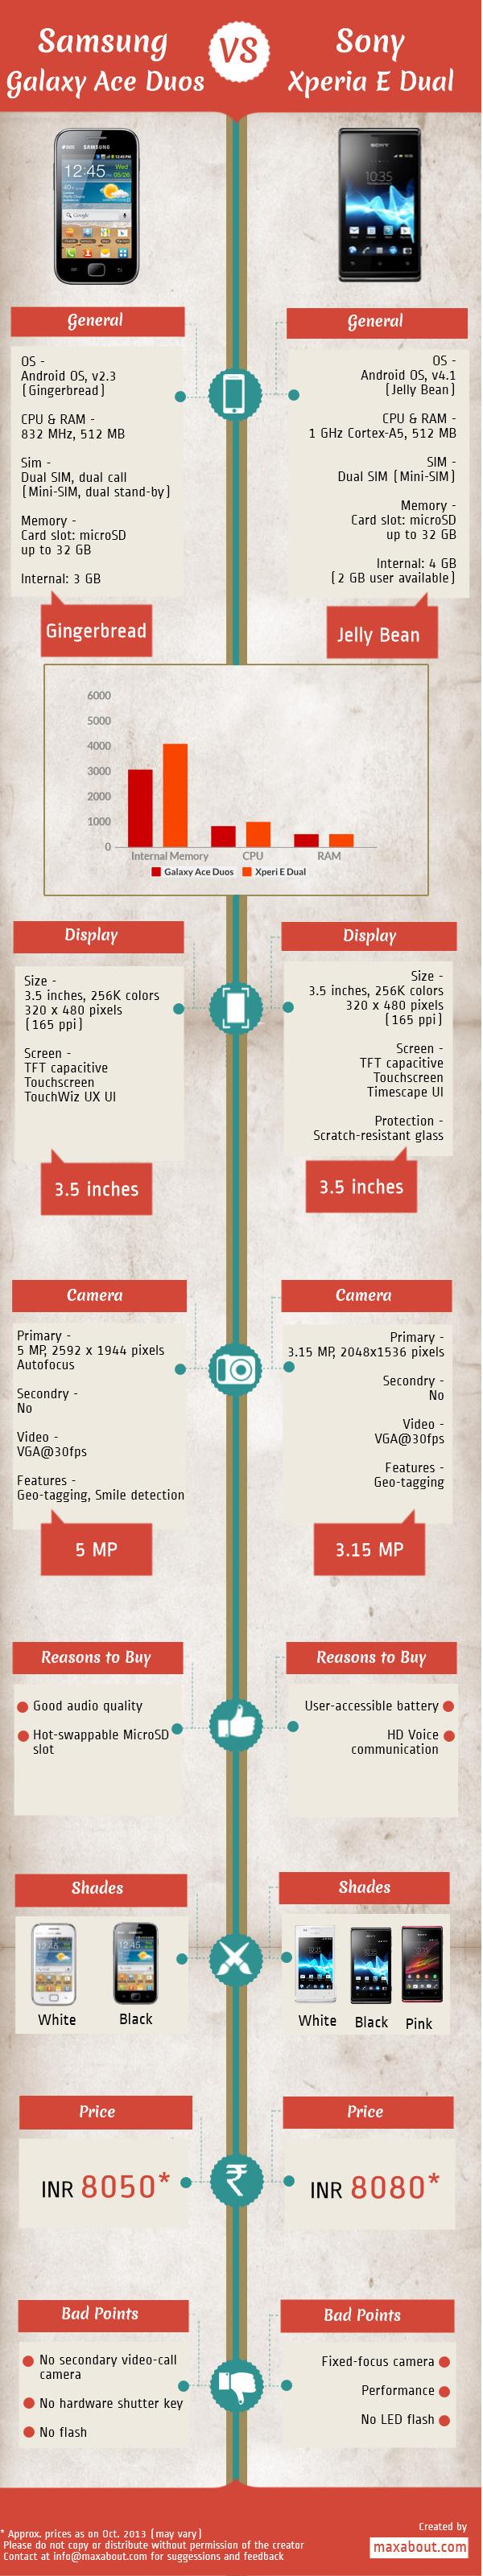 Samsung Galaxy Ace Duos VS Sony Experia E-dual